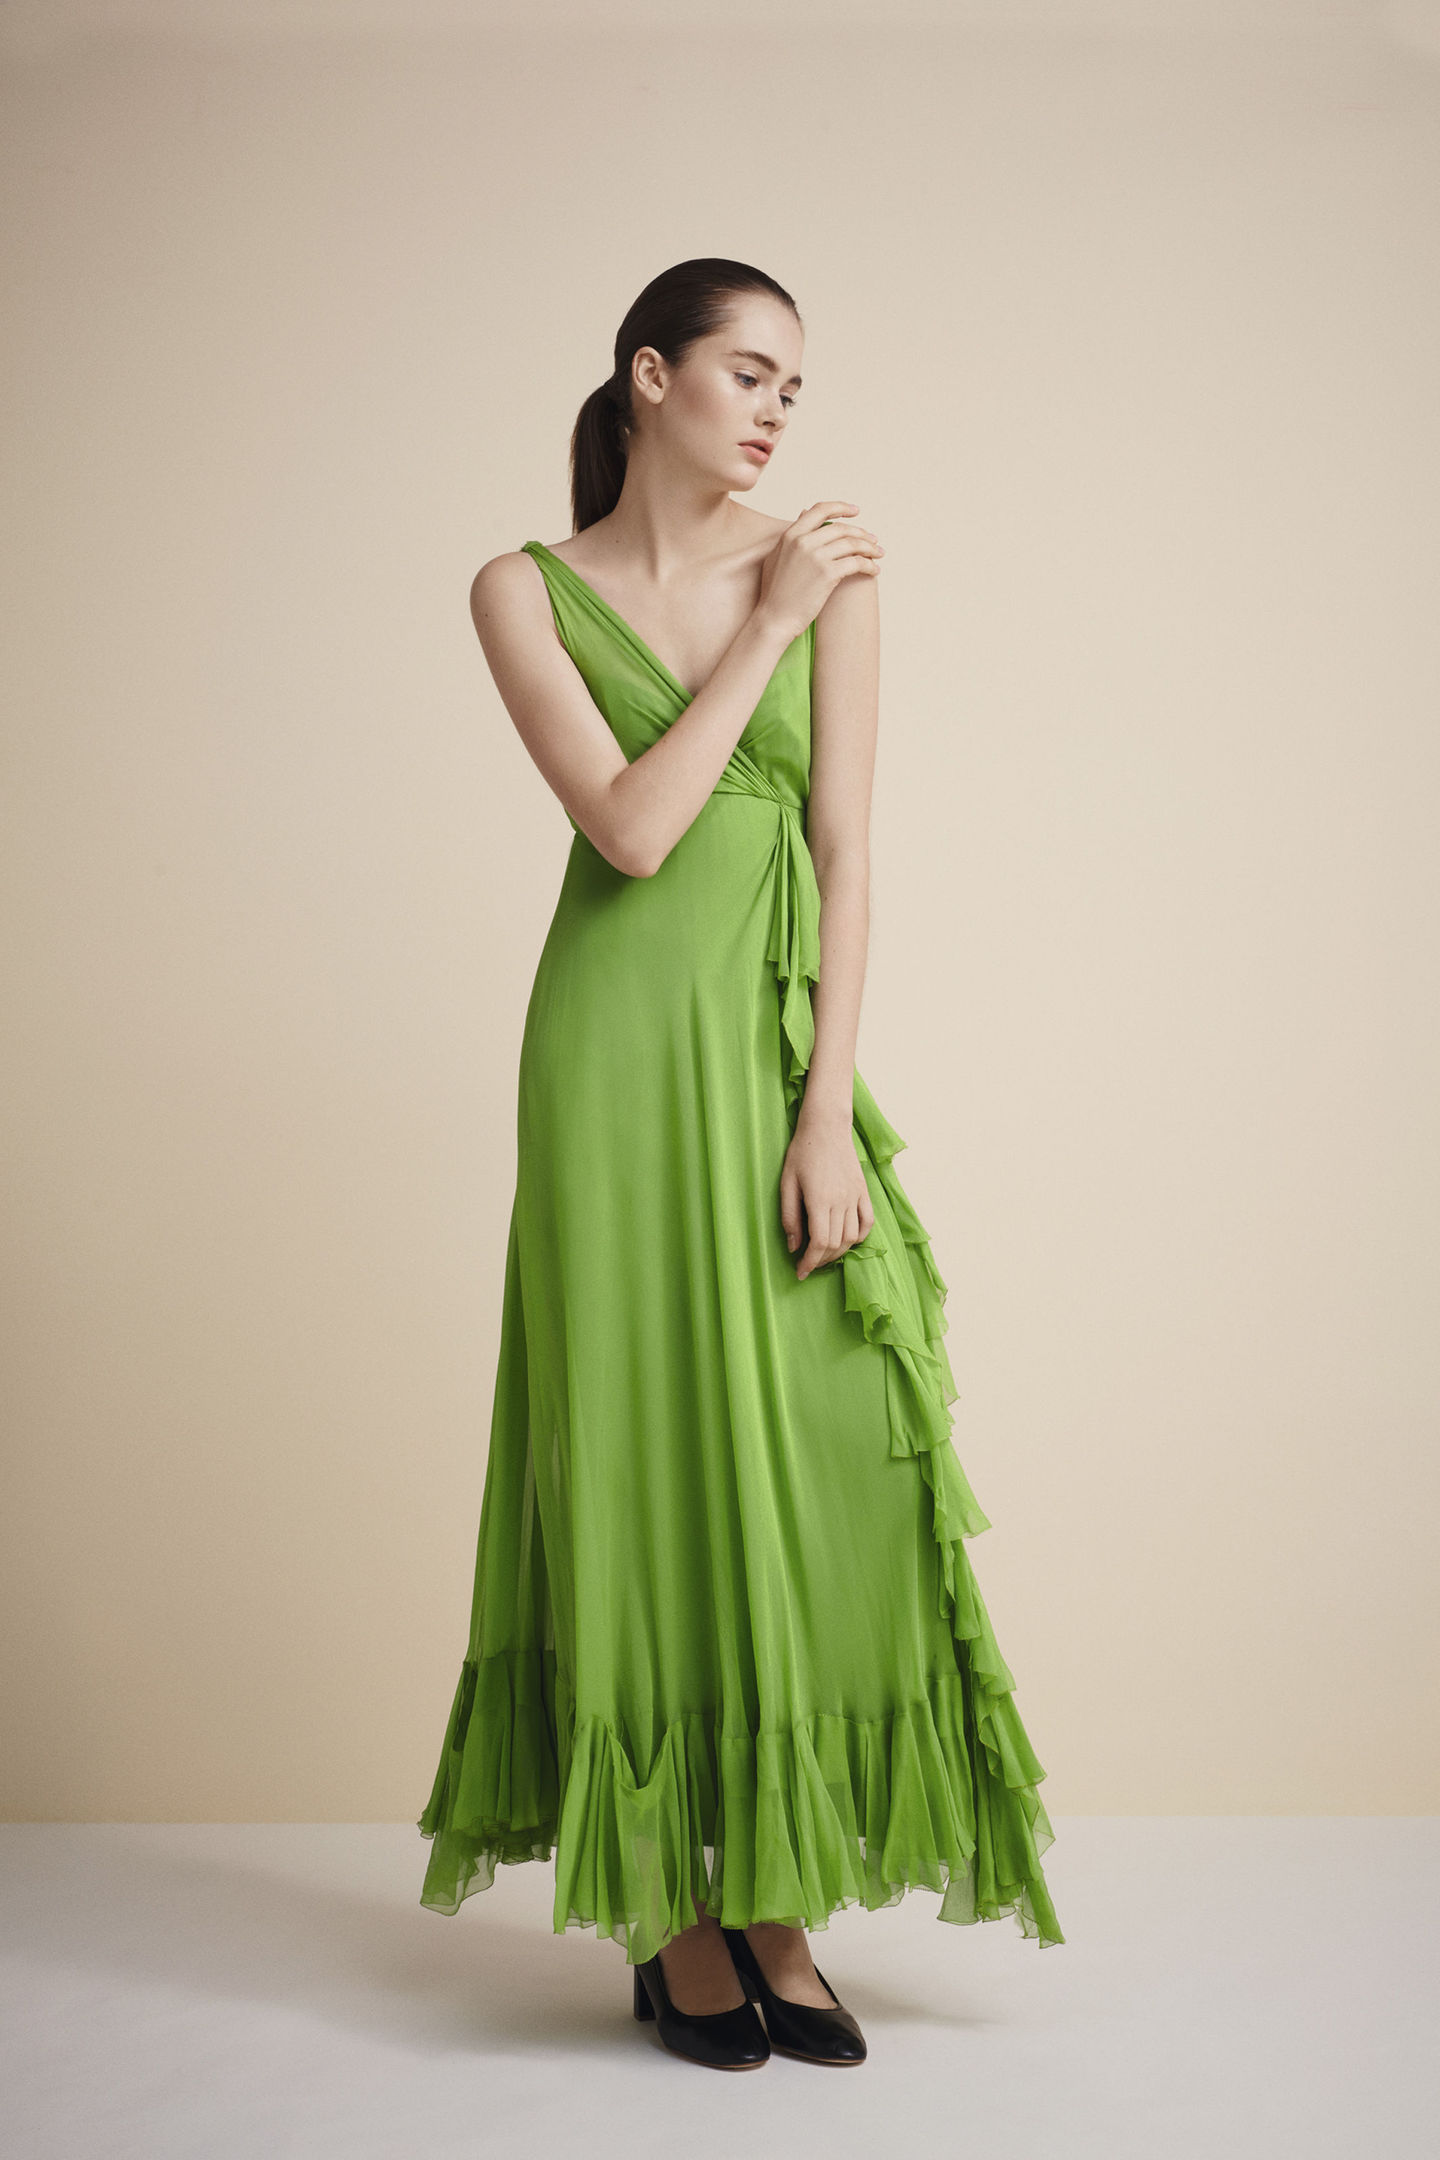 FASHION Greenery 102120